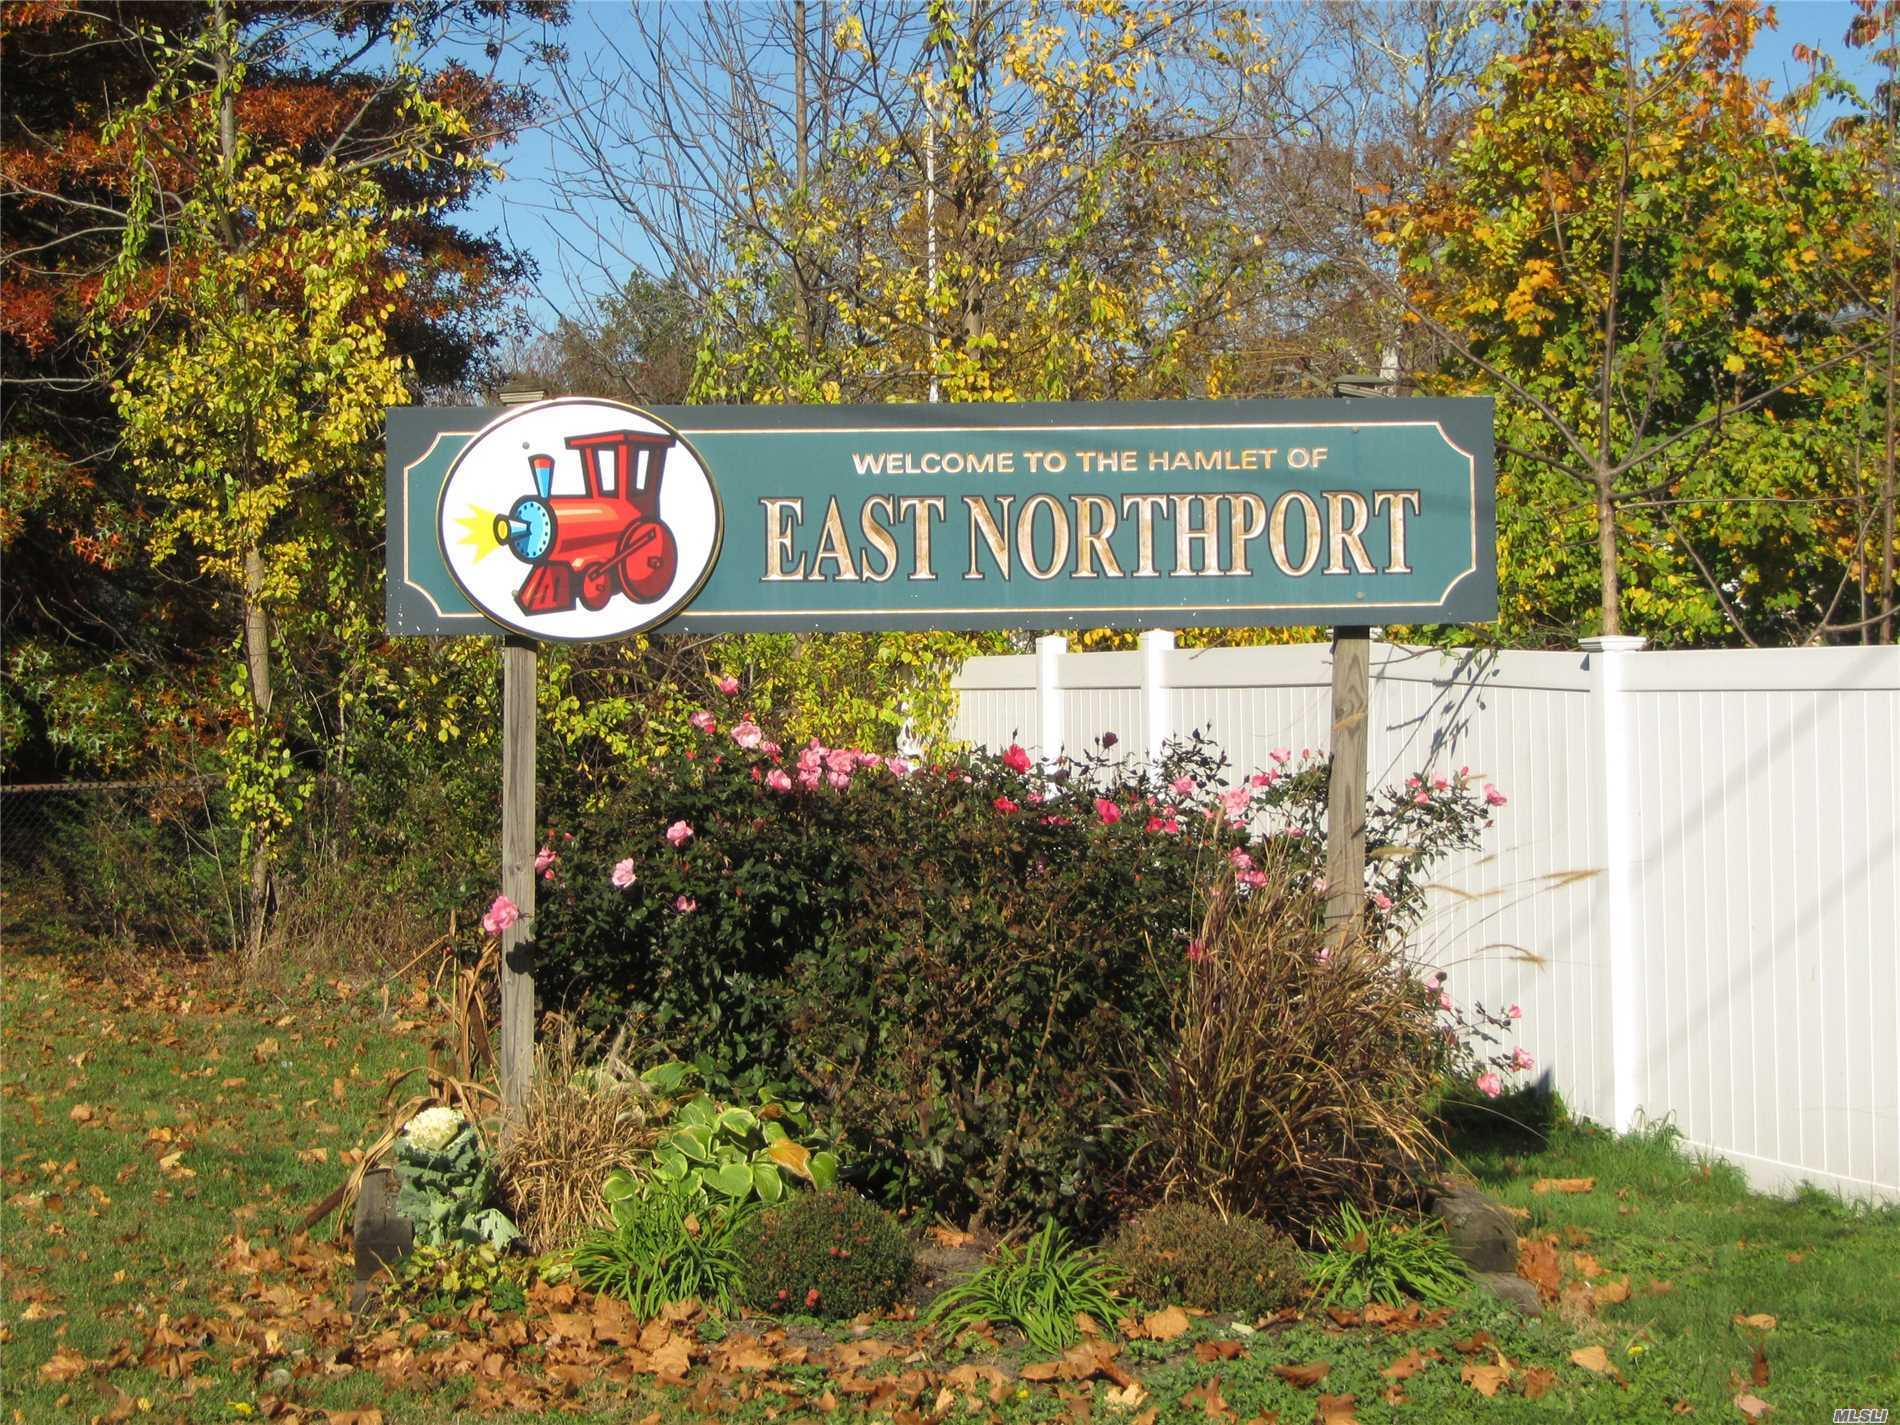 Land Lot Laurel Rd - E. Northport, New York